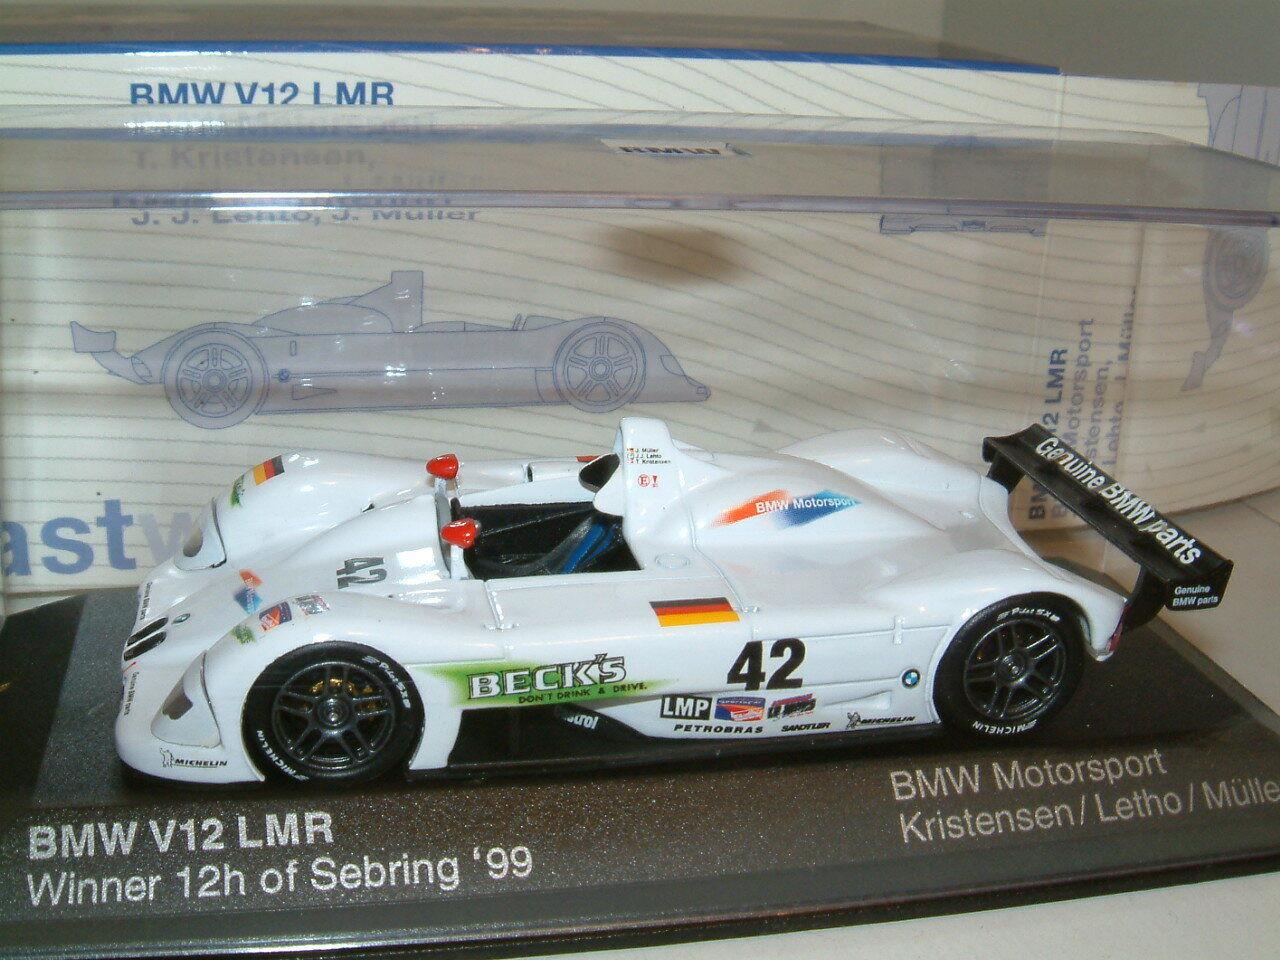 muchas sorpresas 1 43 1999 1999 1999 BMW V12 LMR 12 H SEBRING GANADOR. Kristensen LETHO MULLER MINICHAMPS  calidad garantizada